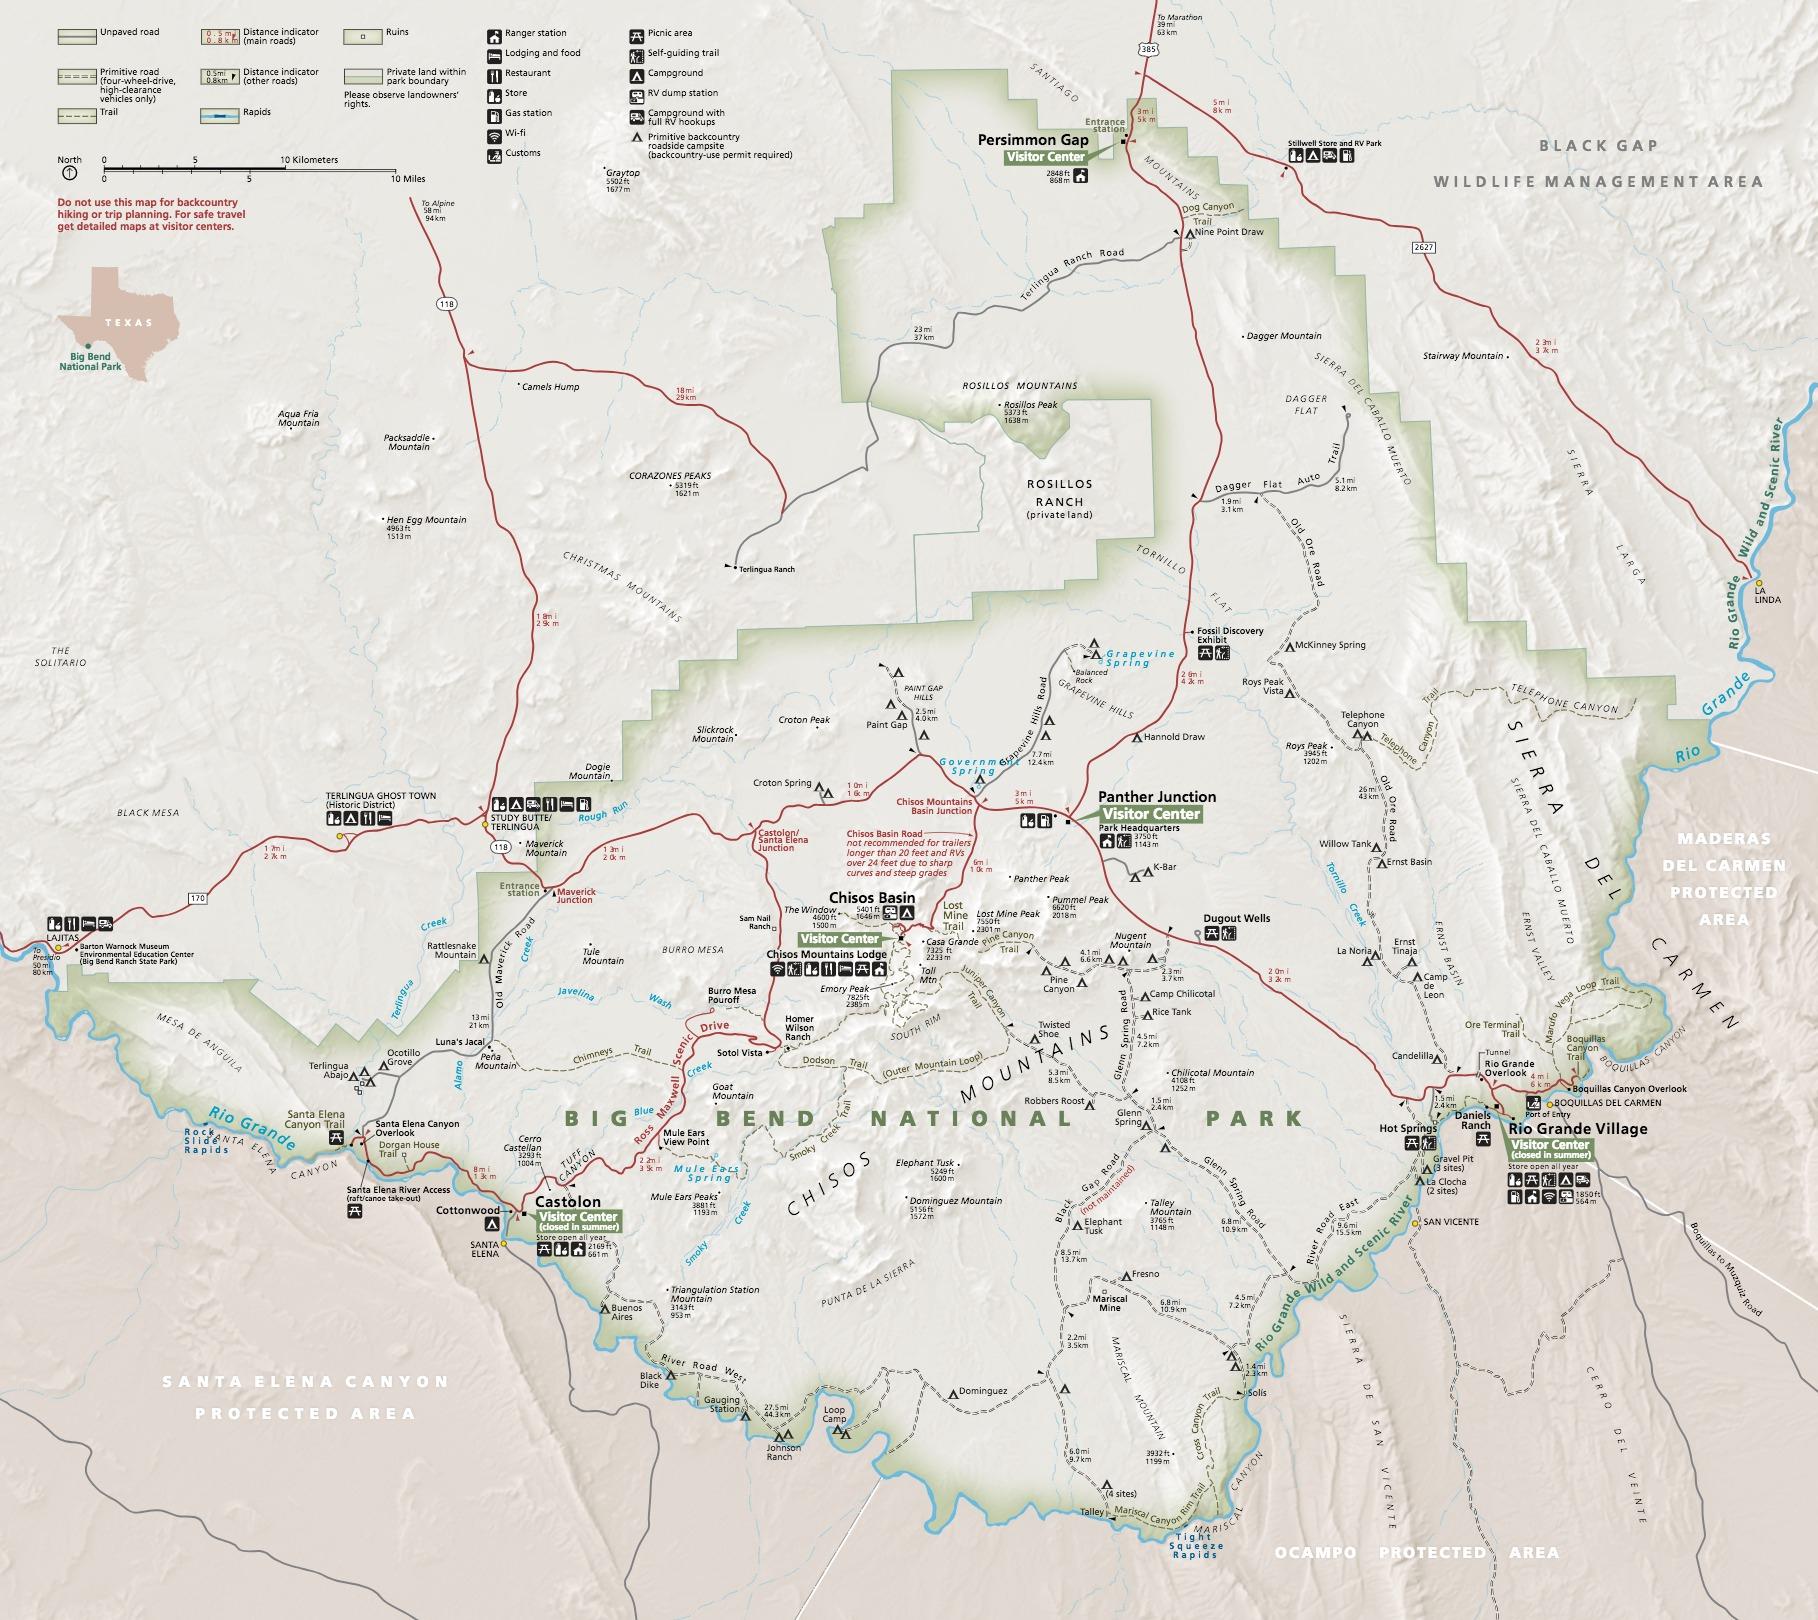 Maps - Big Bend National Park (U.s. National Park Service) - South Texas Rv Parks Map